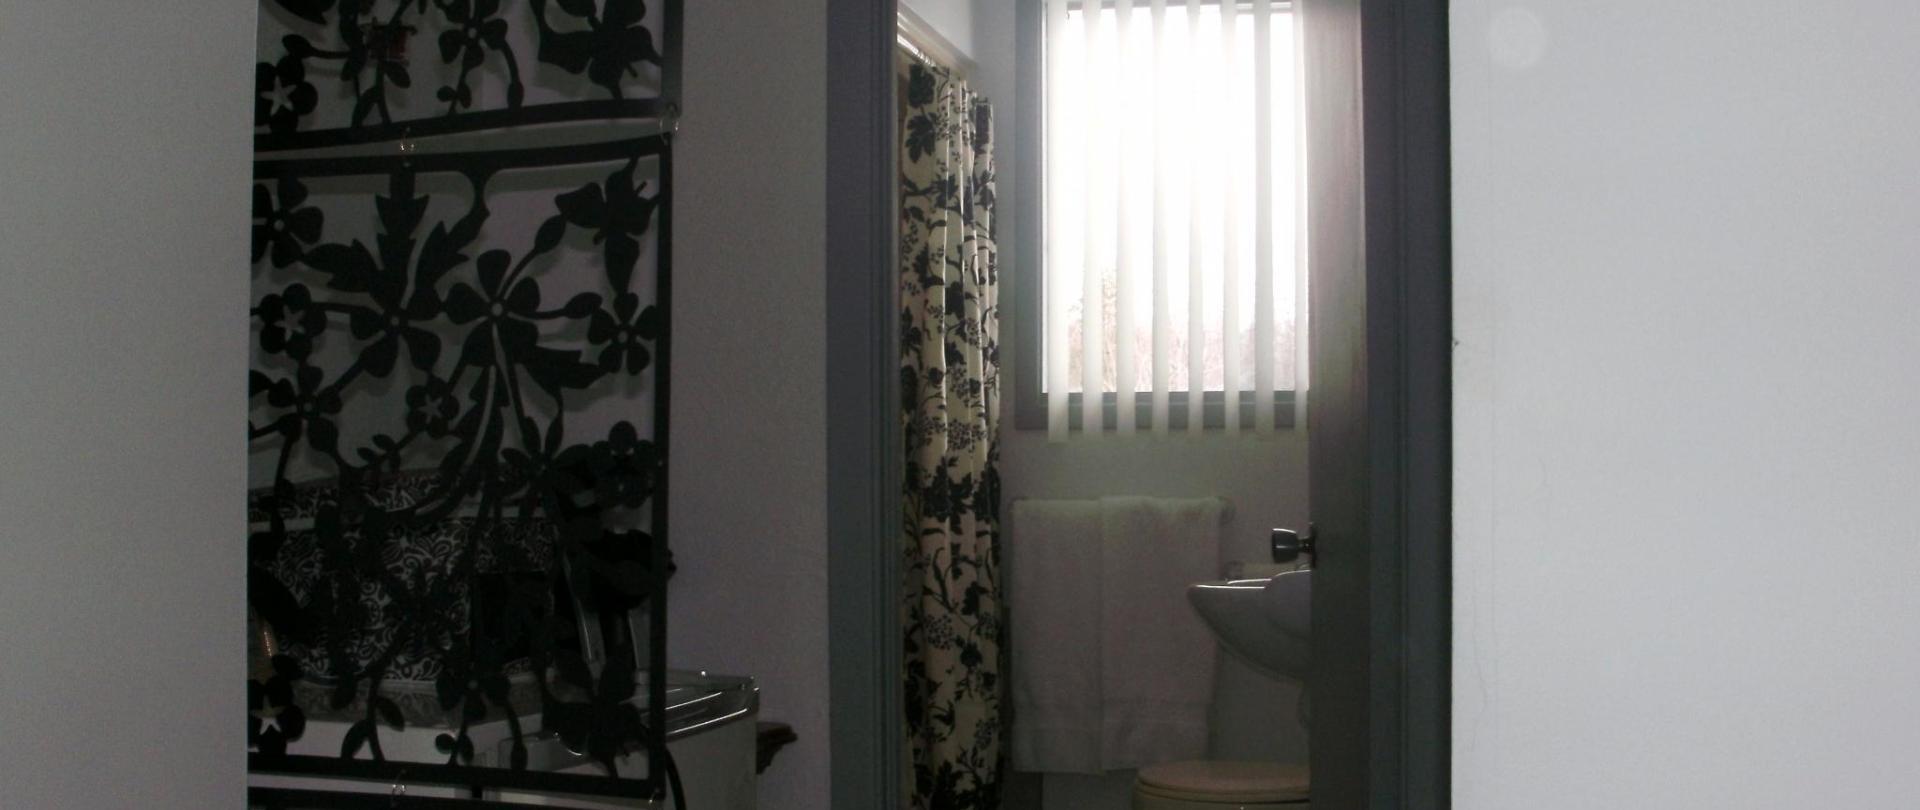 chambre 5 , 8 et 13 002.JPG